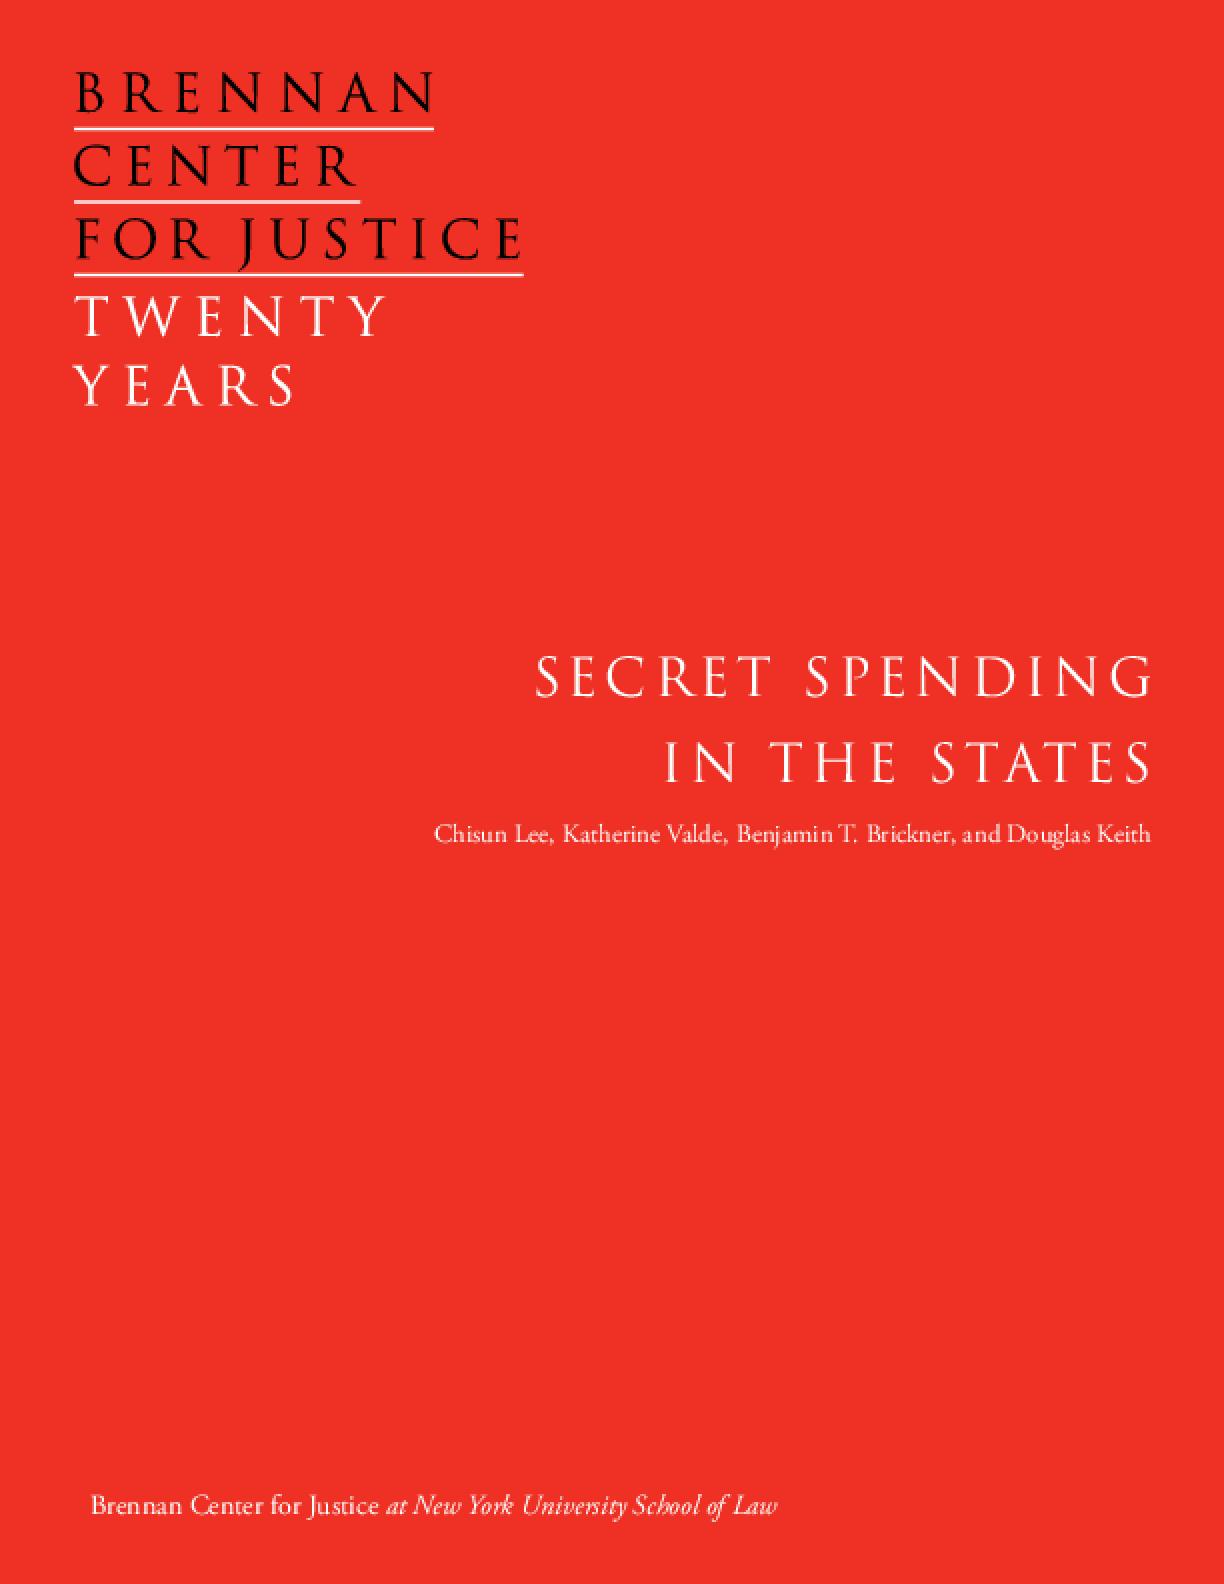 Secret Spending in the States